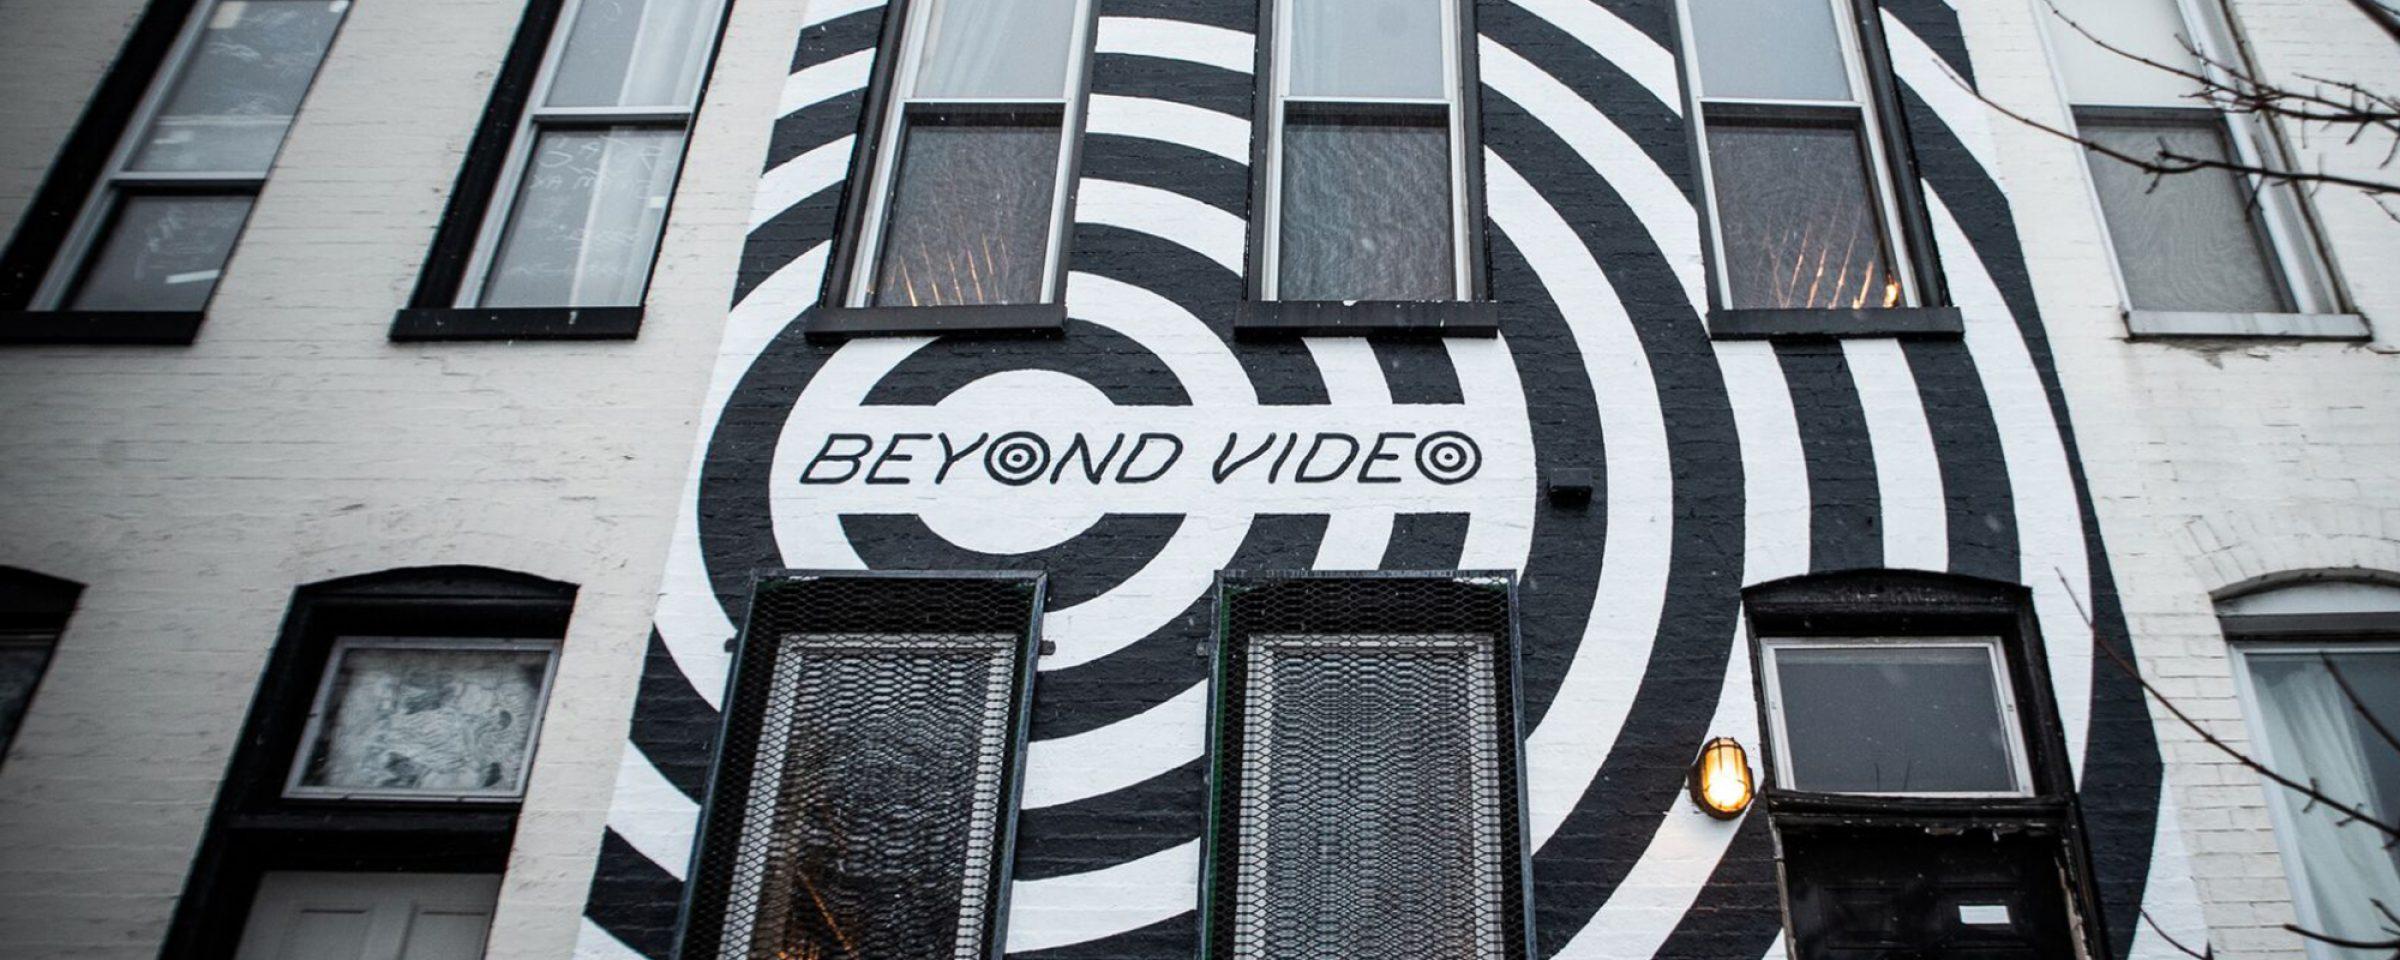 Byond Video Header2